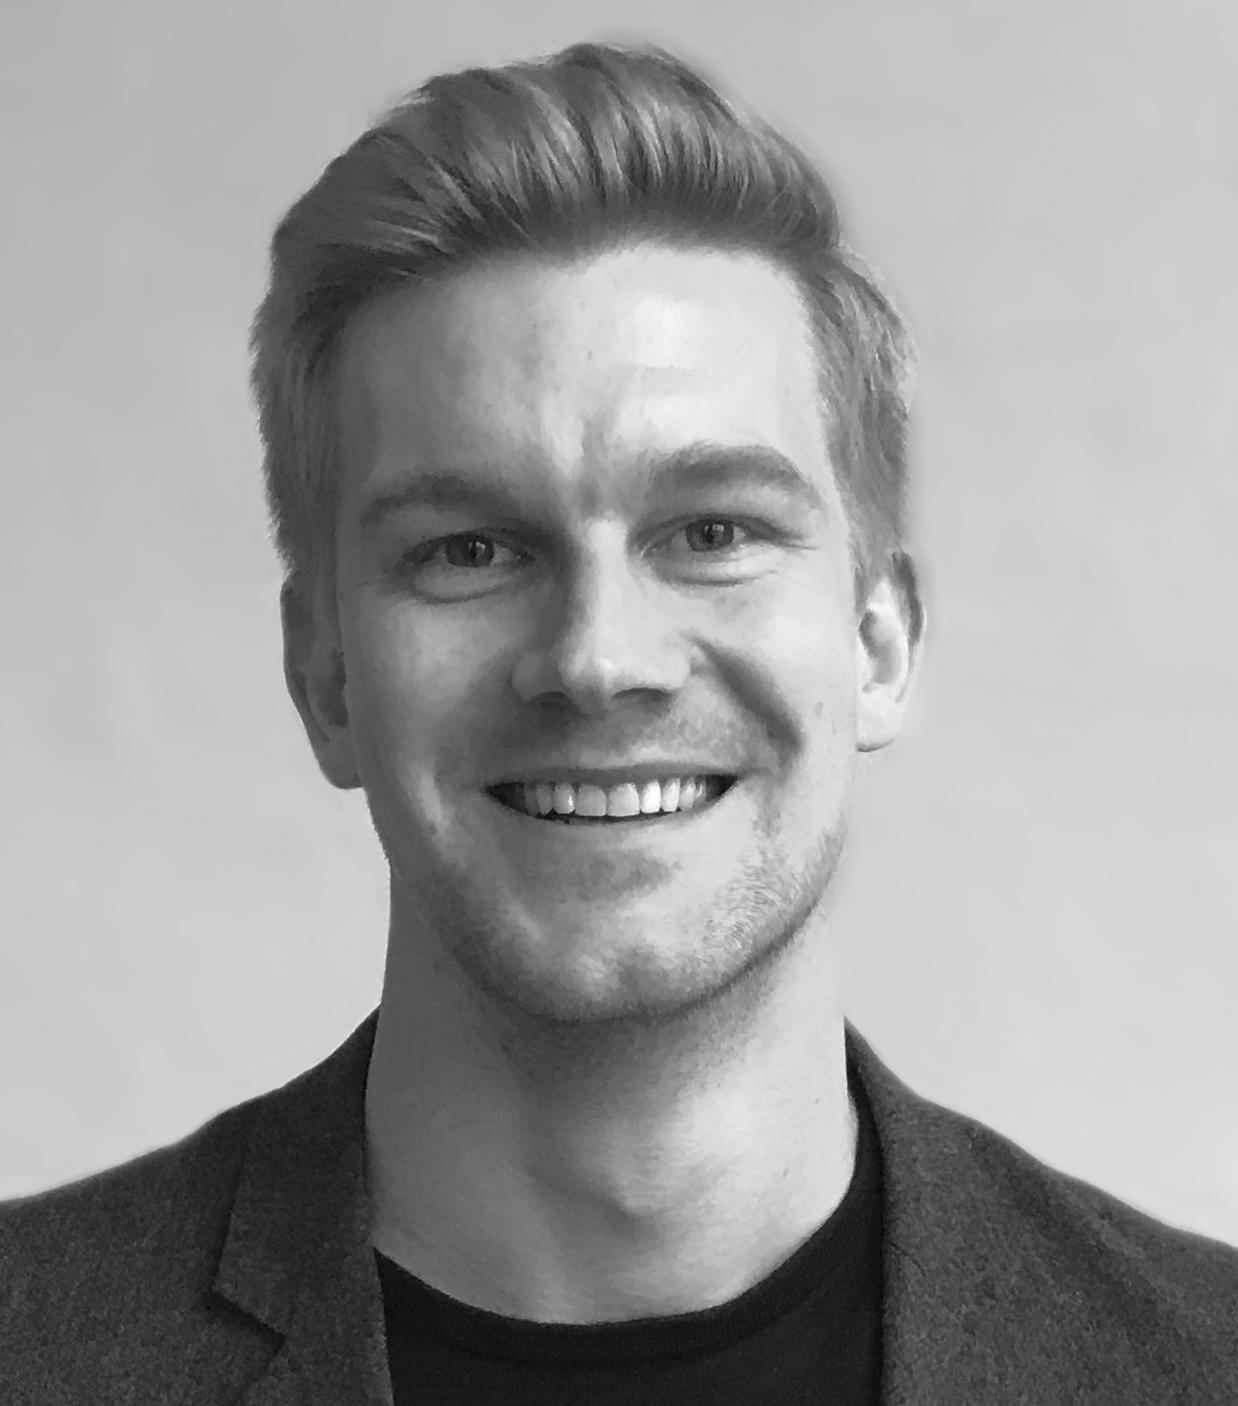 Christian B. Knudsen